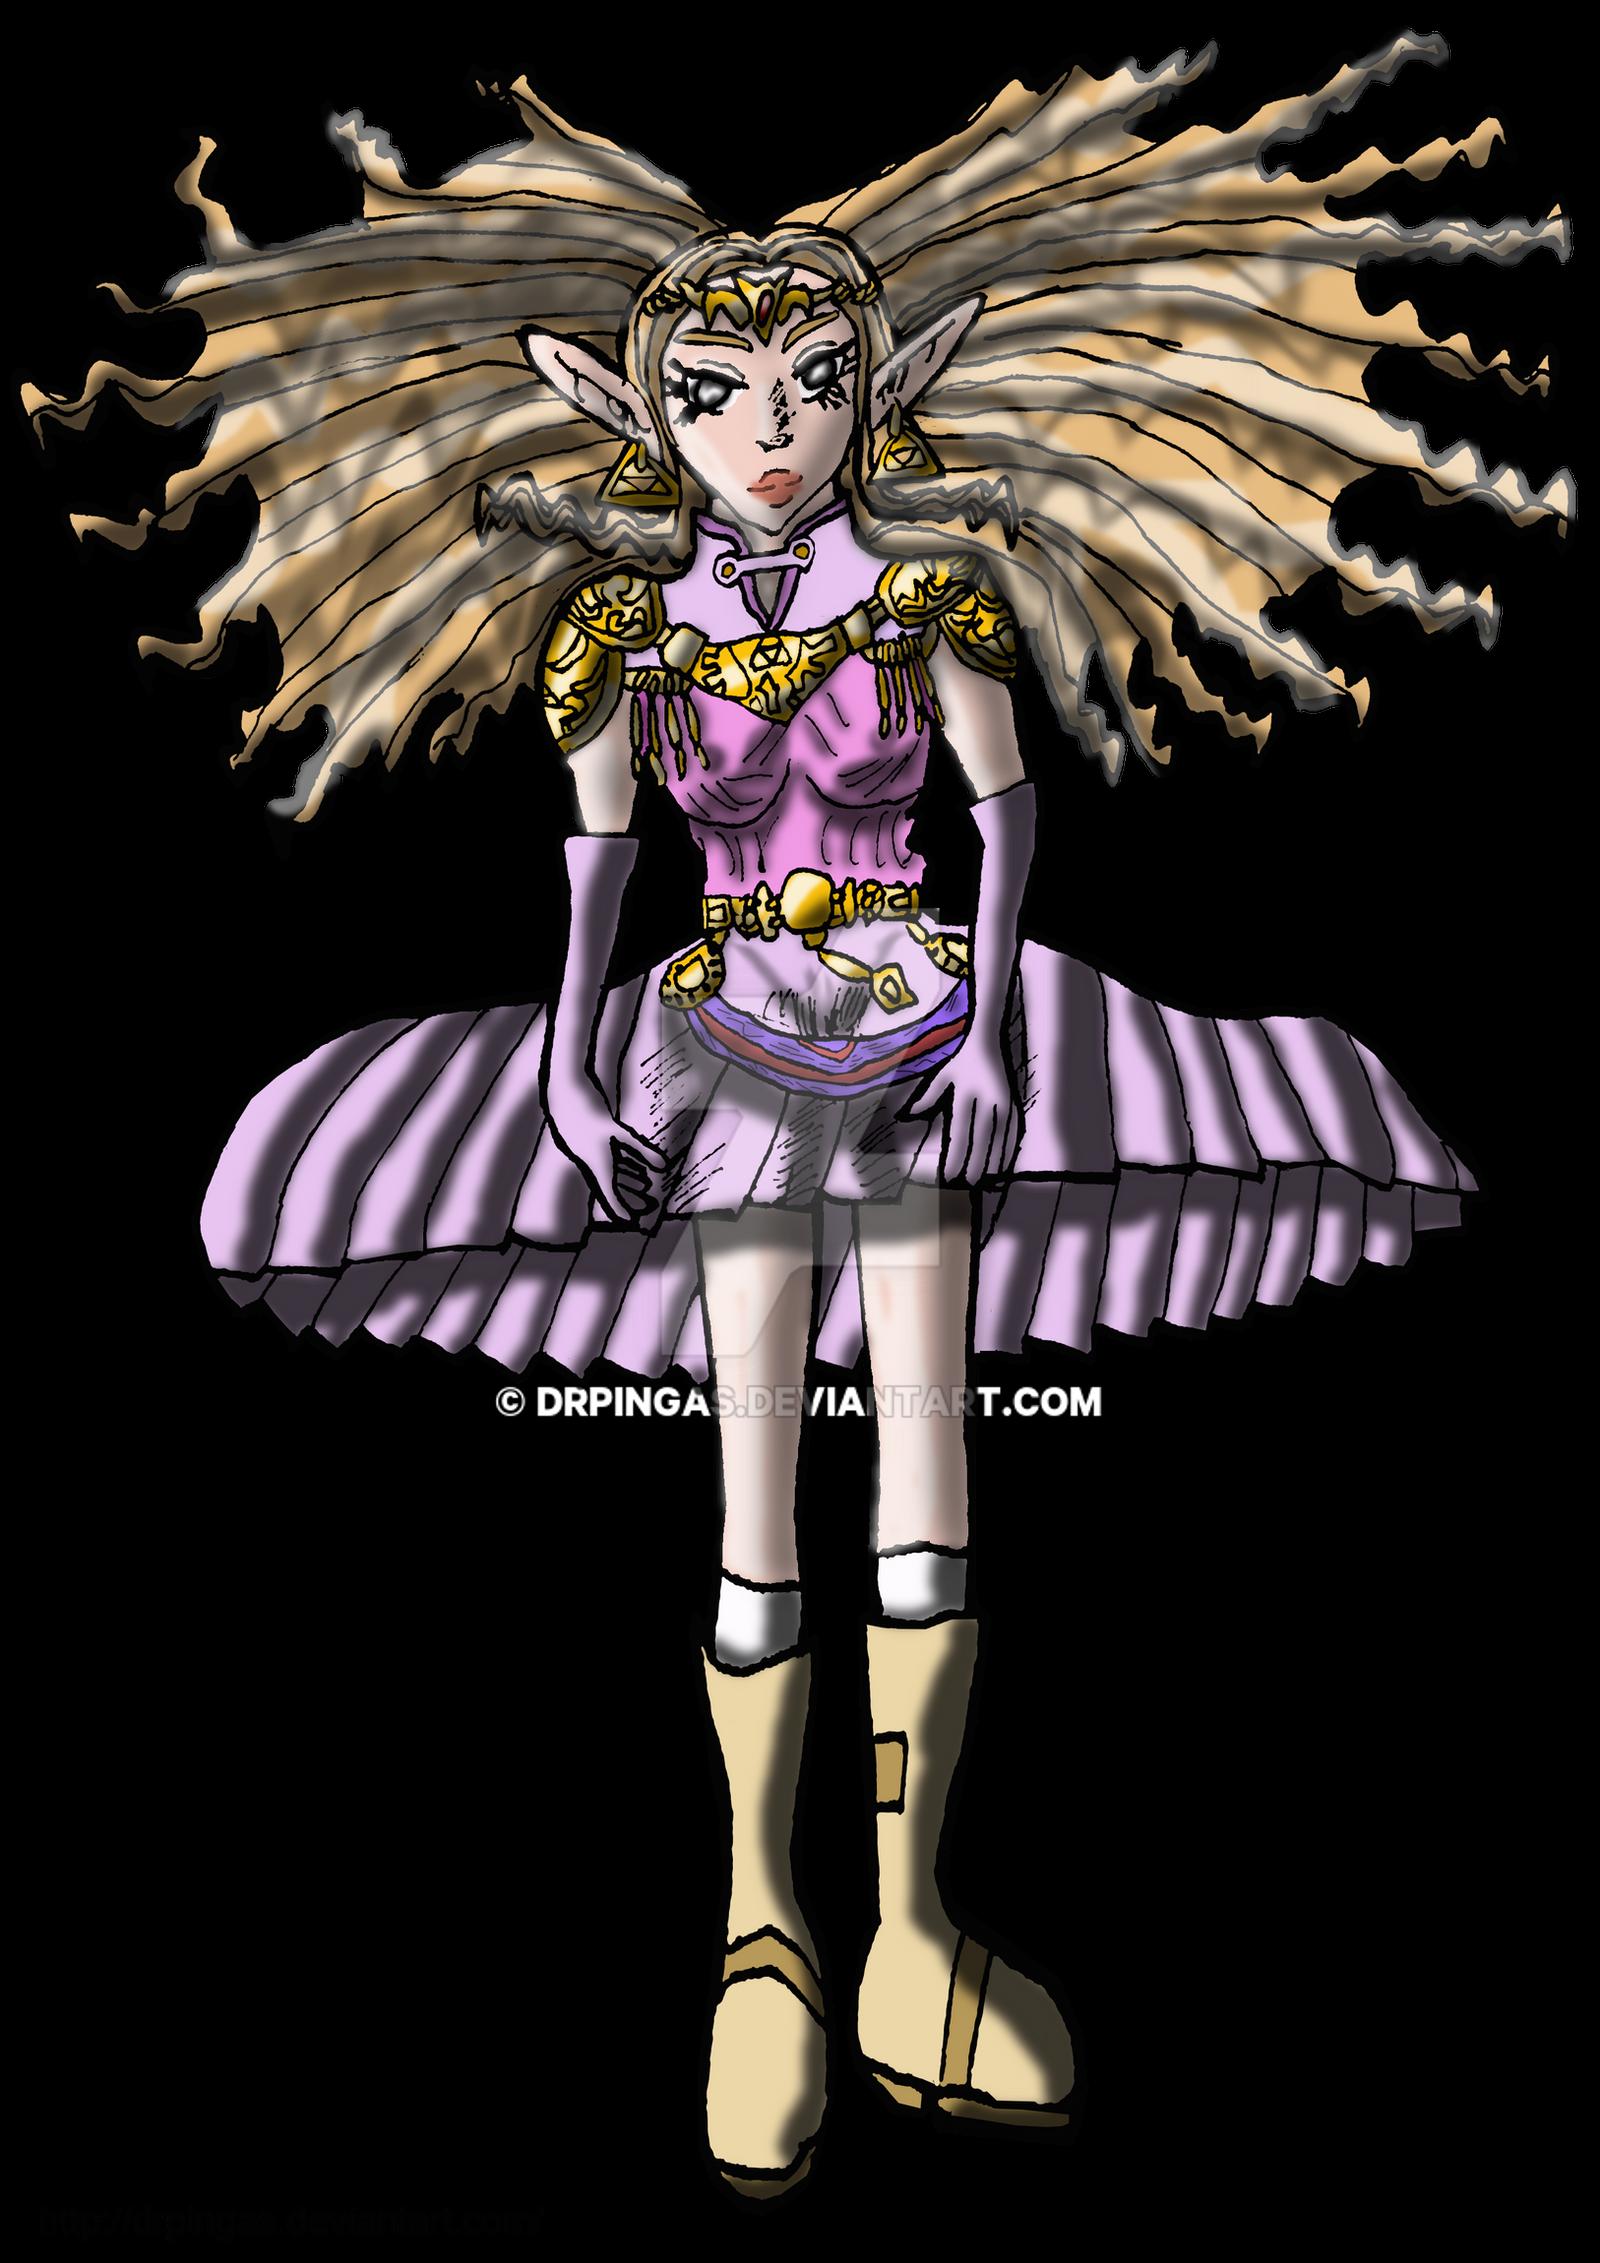 Zelda Fantasma Ocarina Kingdom Hearts JR by DrPingas